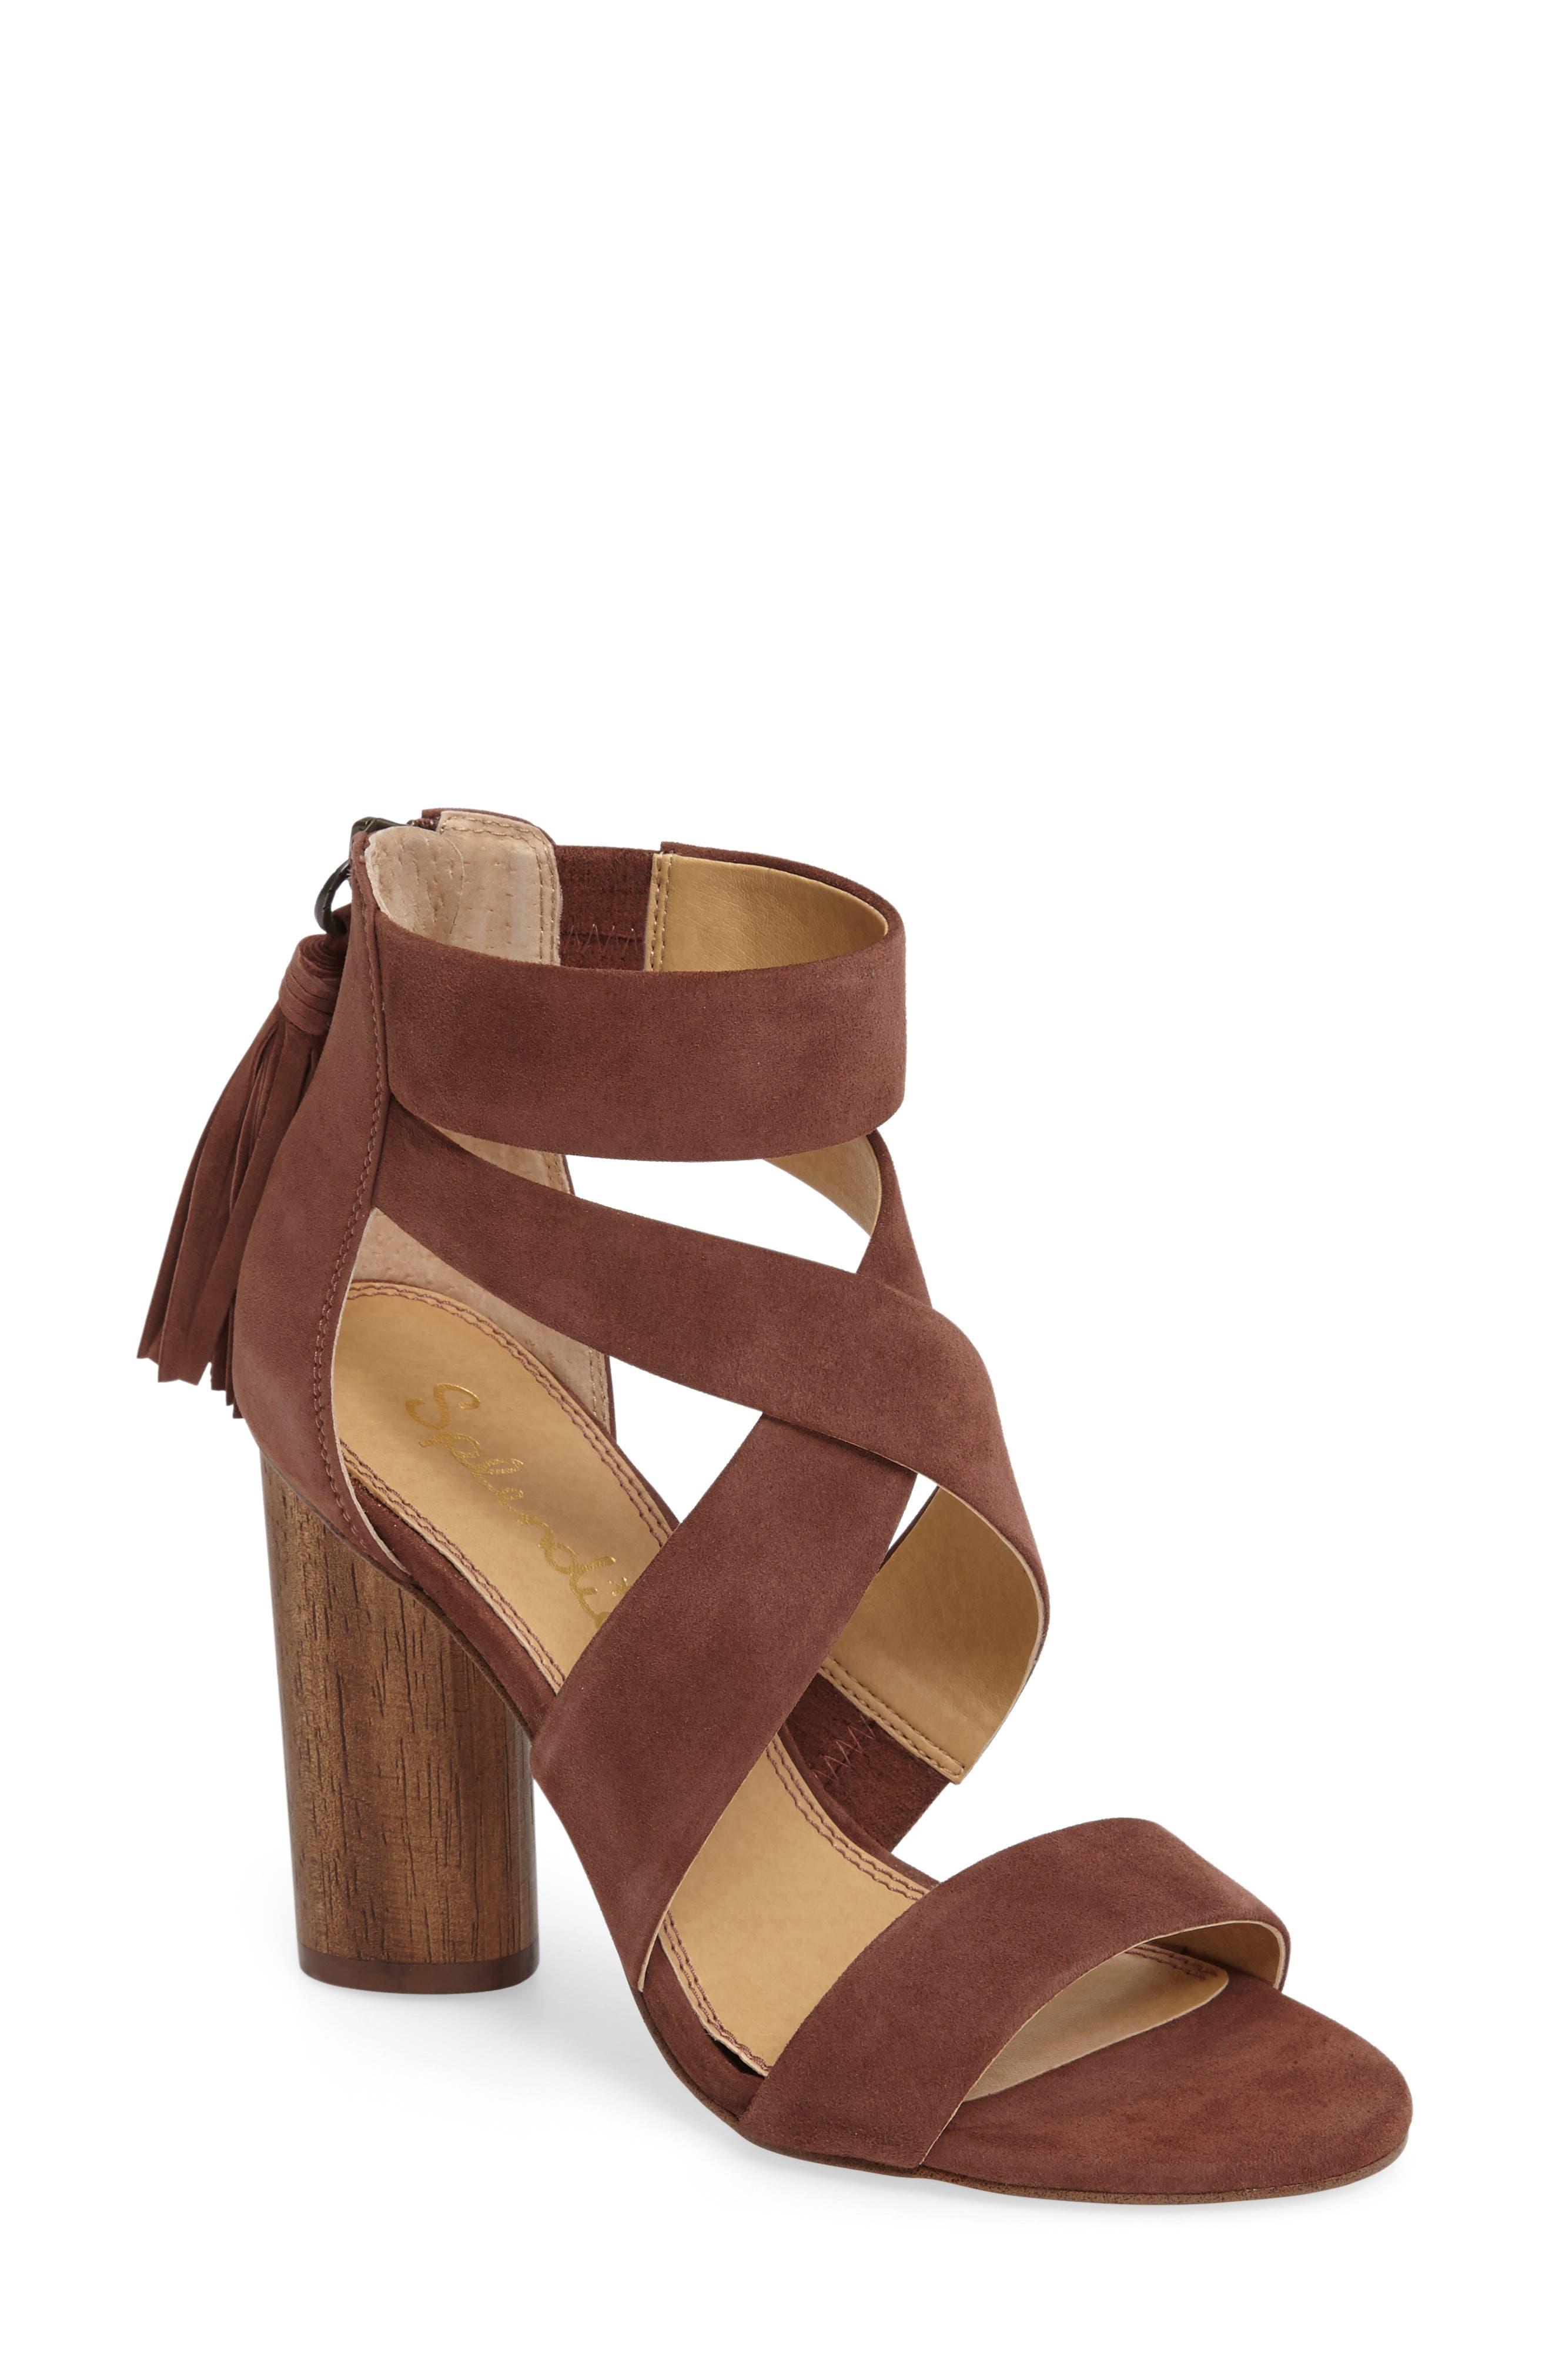 Alternate Image 1 Selected - Splendid Jara Statement Heel Sandal (Women)